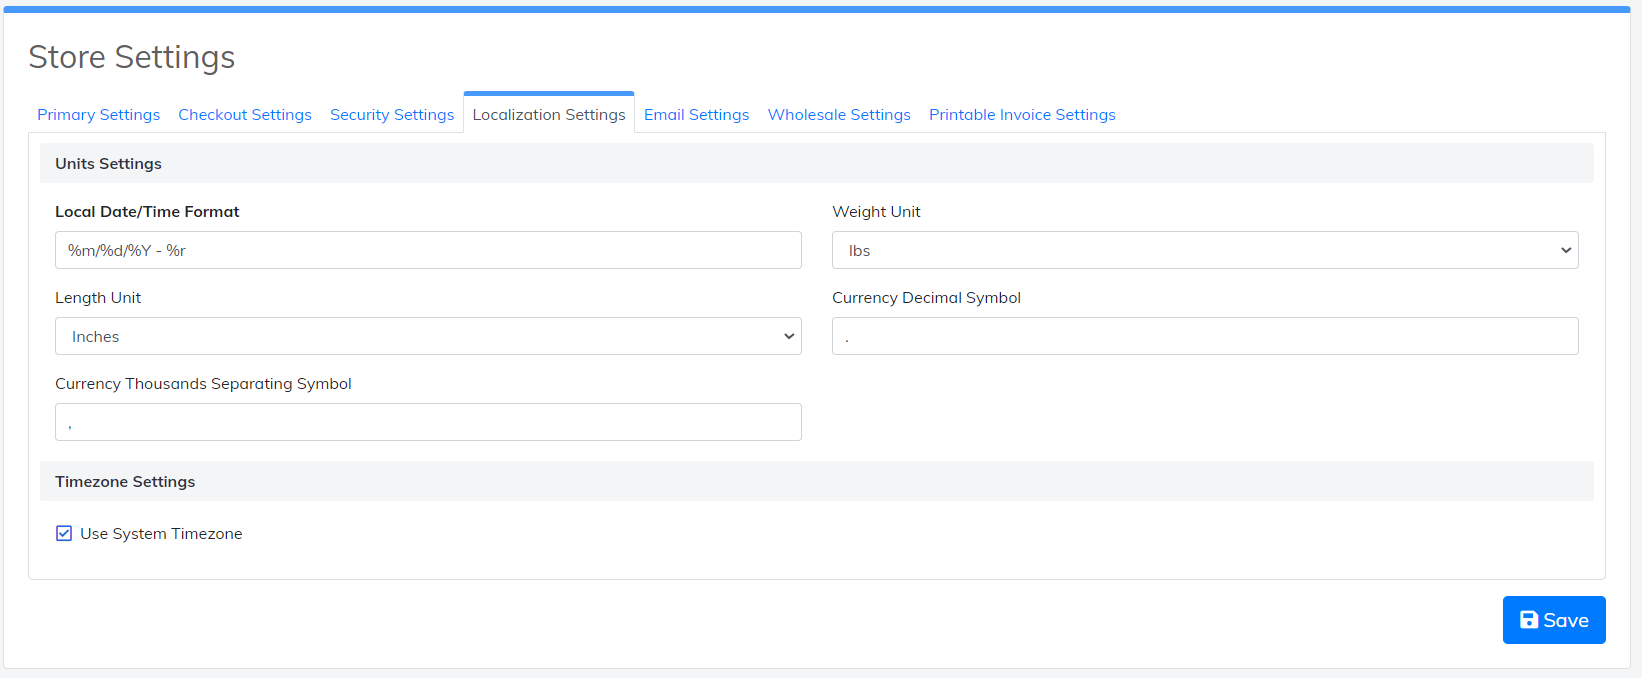 localization settings